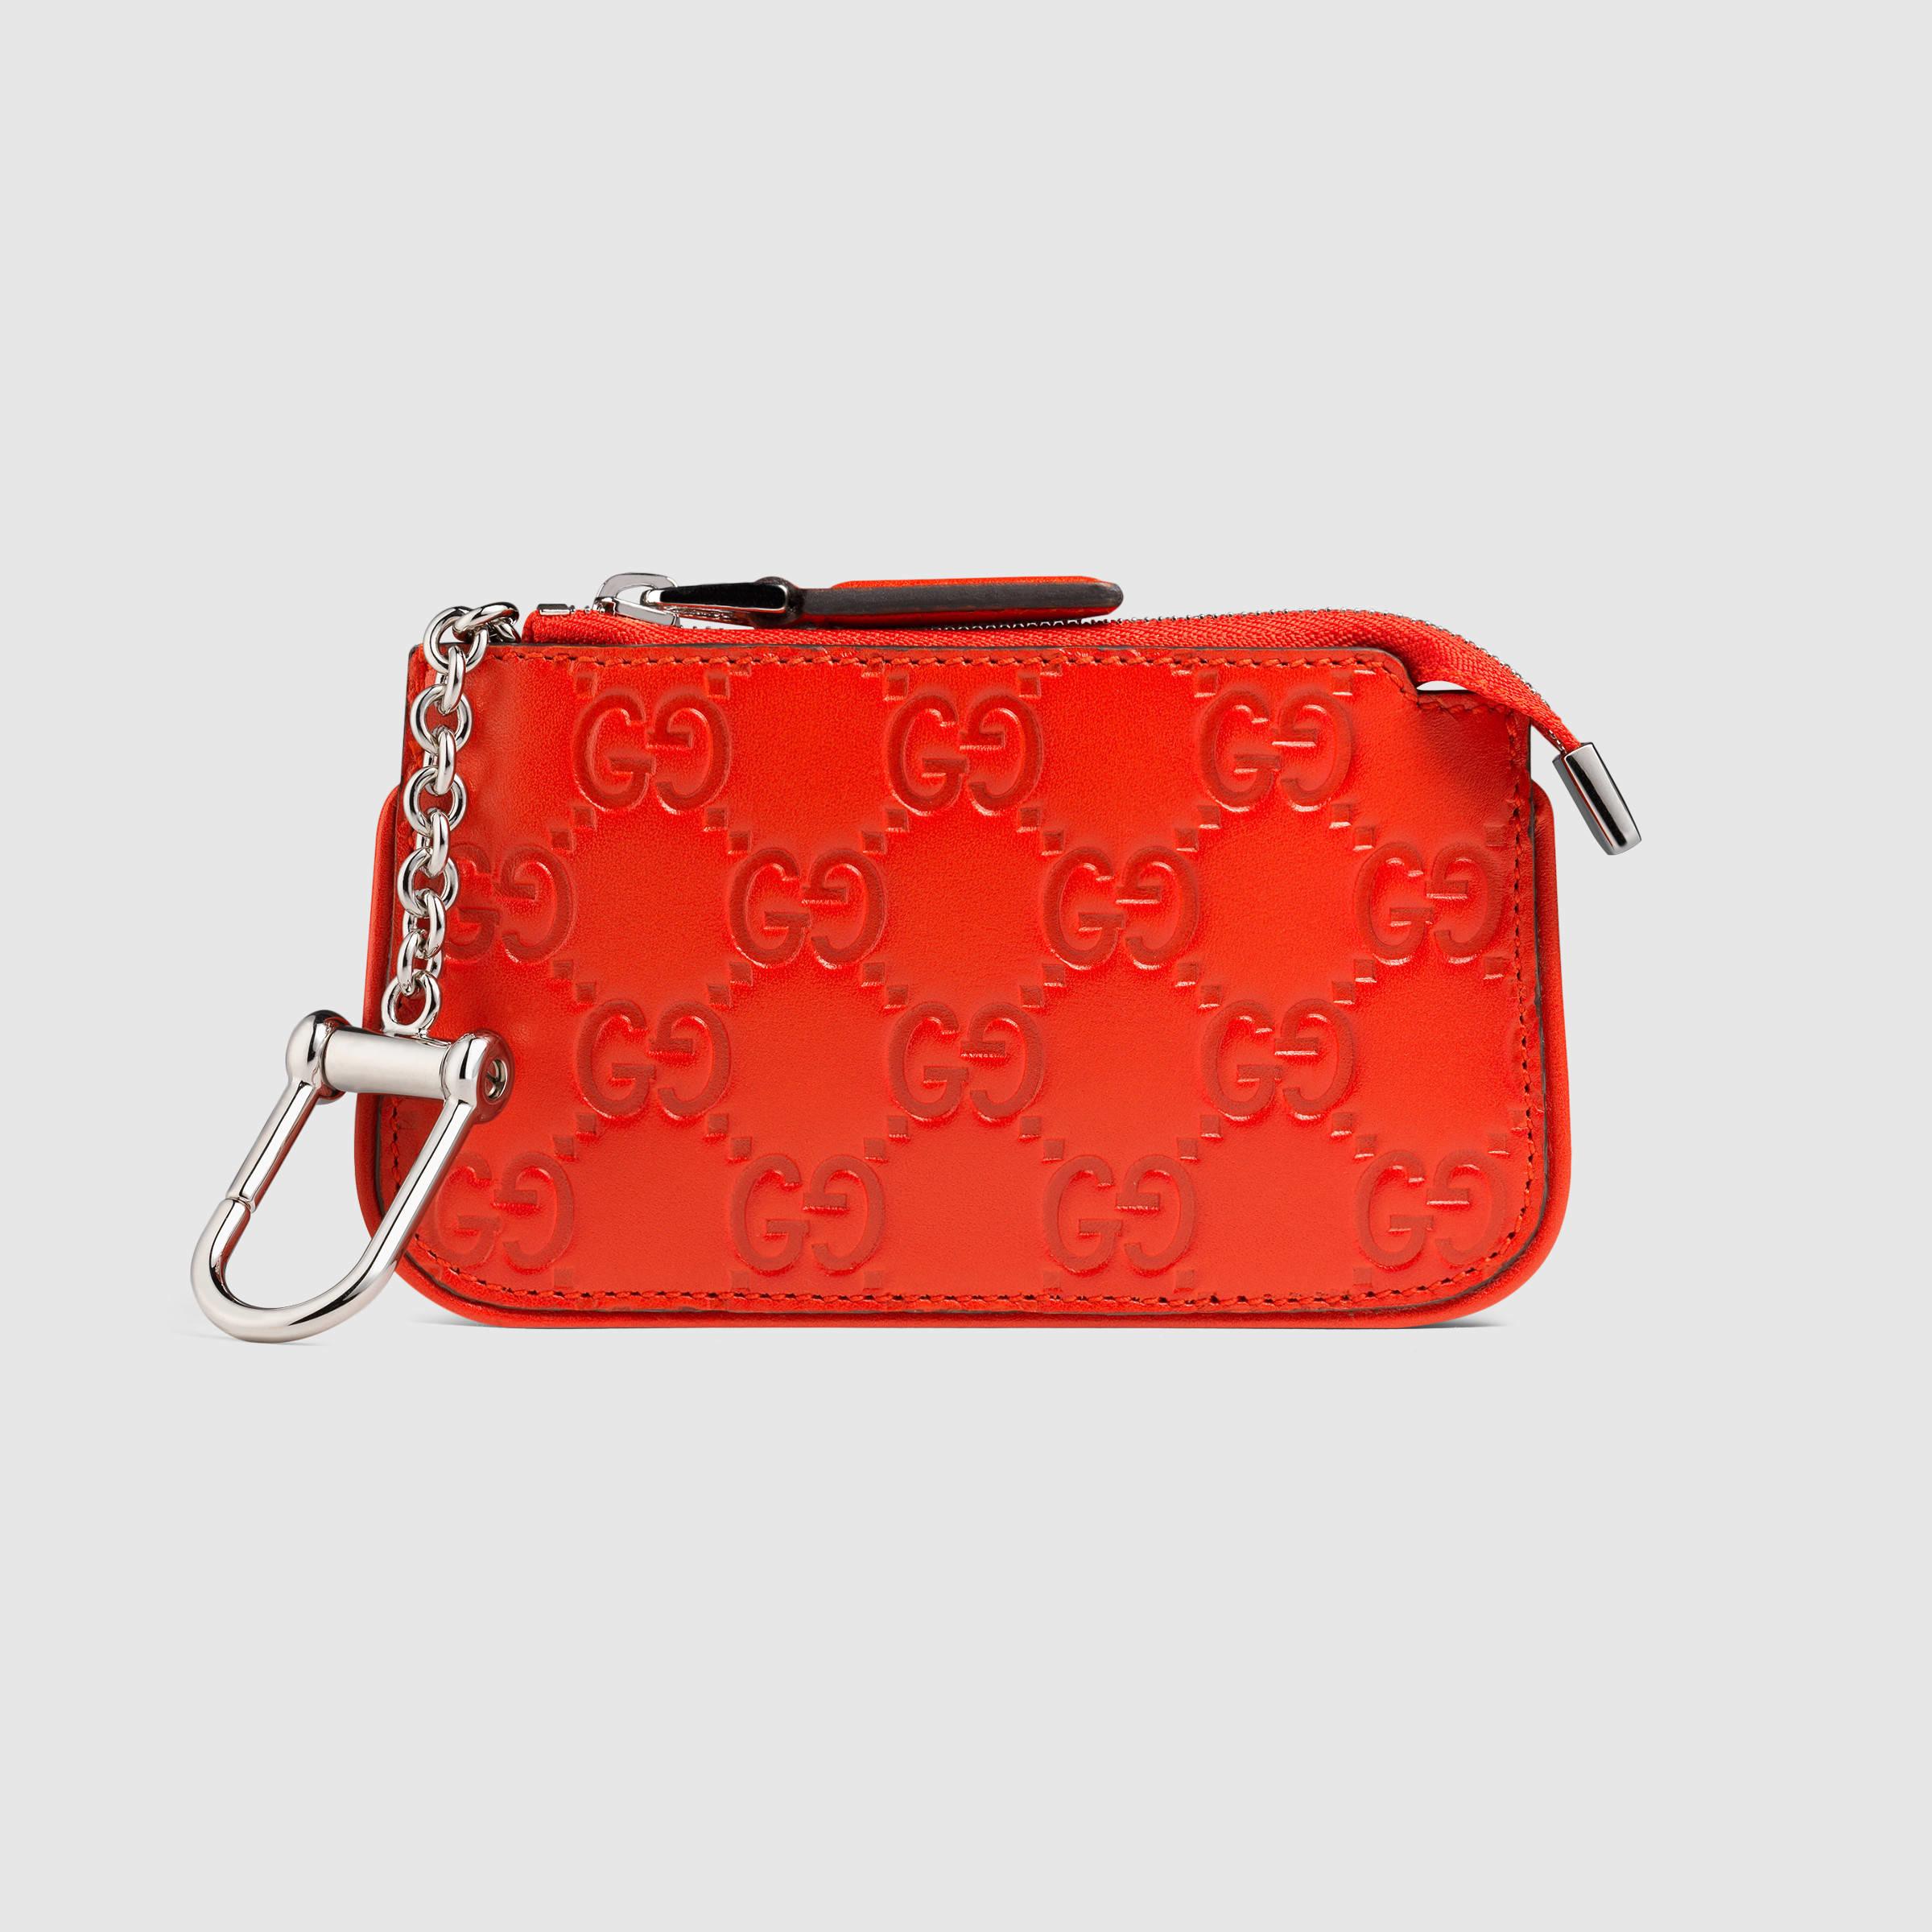 gucci key pouch. gallery gucci key pouch